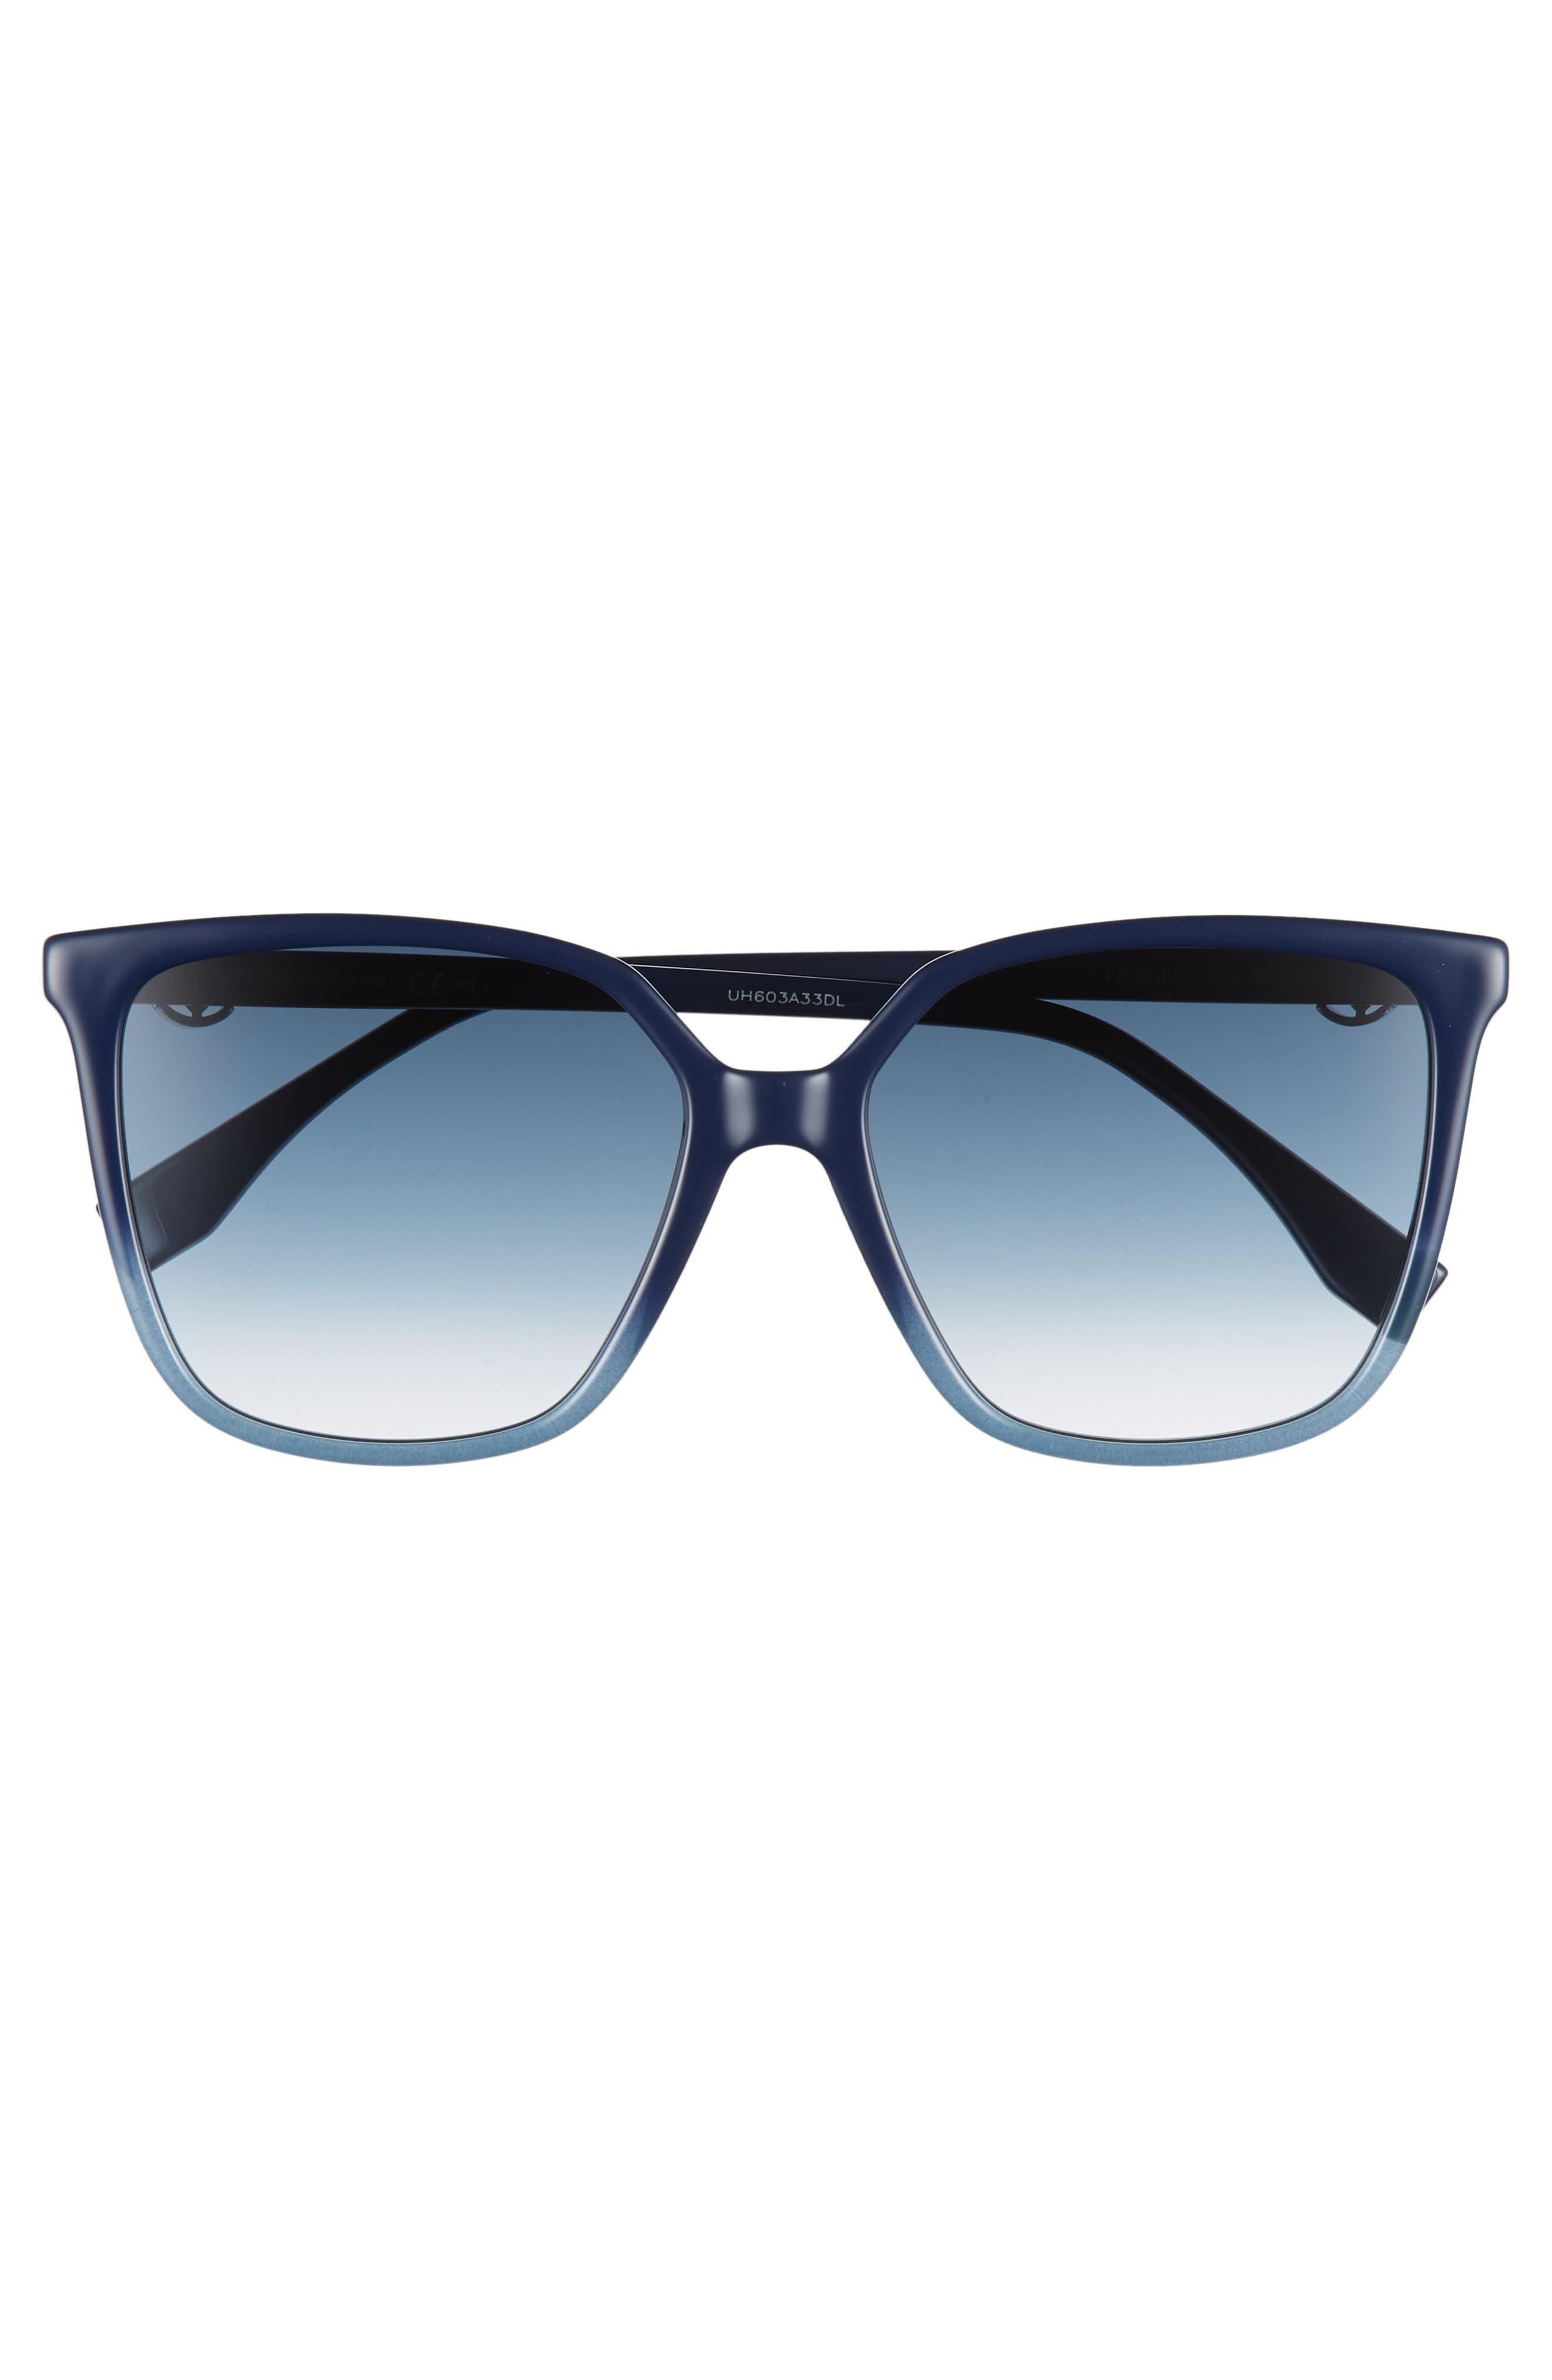 57mm Sunglasses,                             Alternate thumbnail 3, color,                             BLUE